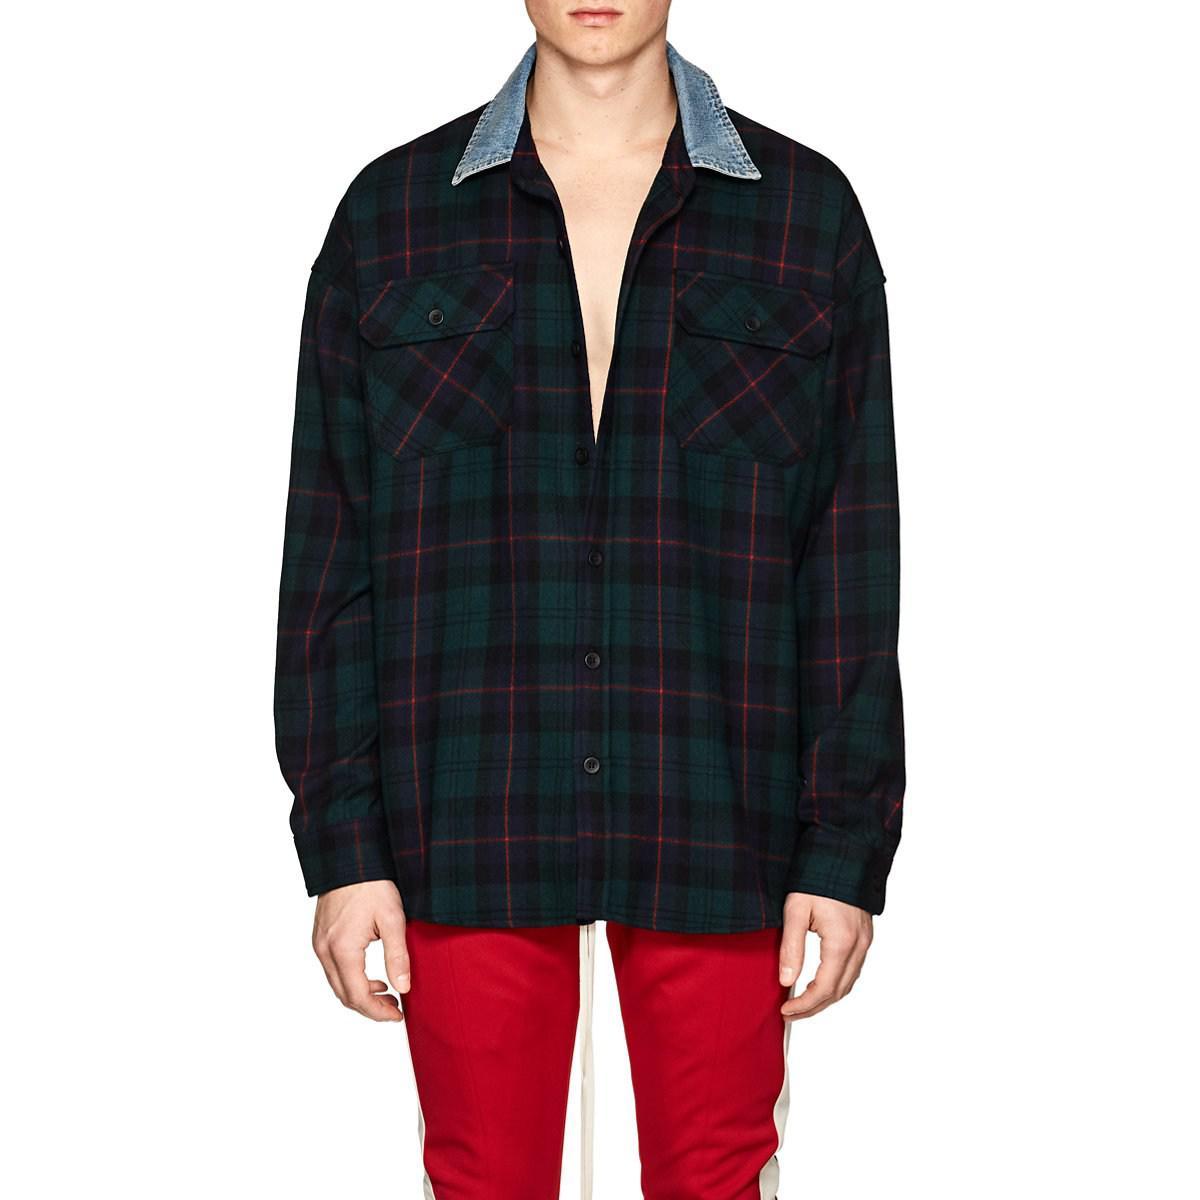 b68cd785c2 Lyst - Fear Of God Plaid Wool Flannel Oversized Shirt in Black for Men